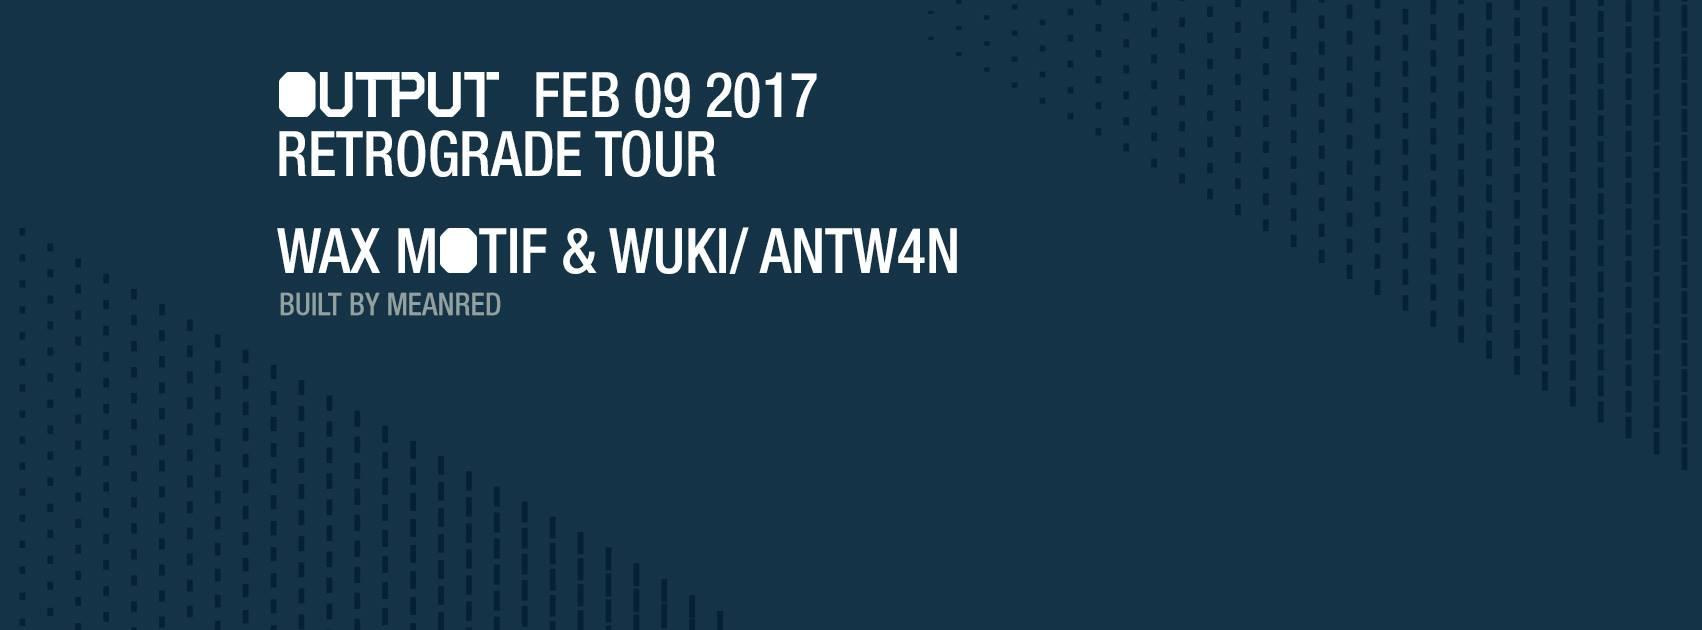 Wax Motif & Wuki Output Robbie Lumpkin Promotions